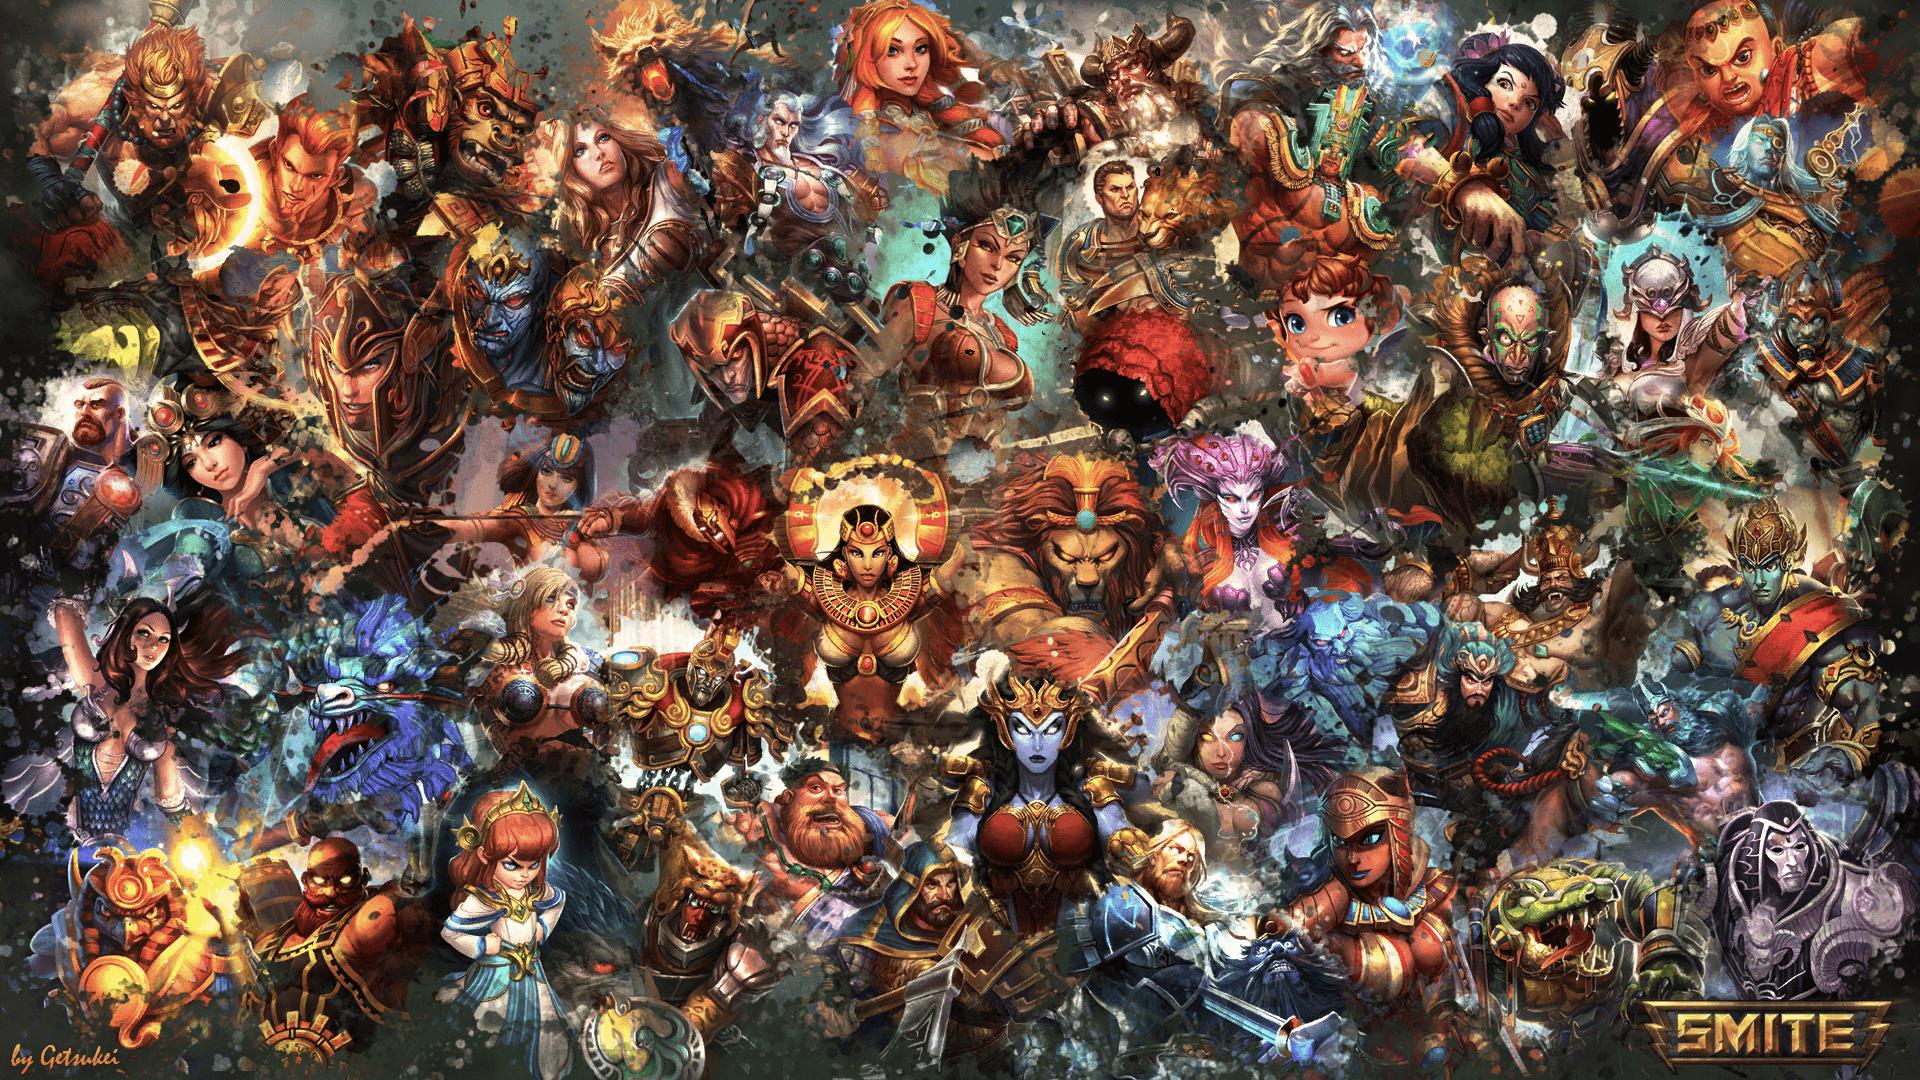 Online Games Wallpapers - Top Free ...